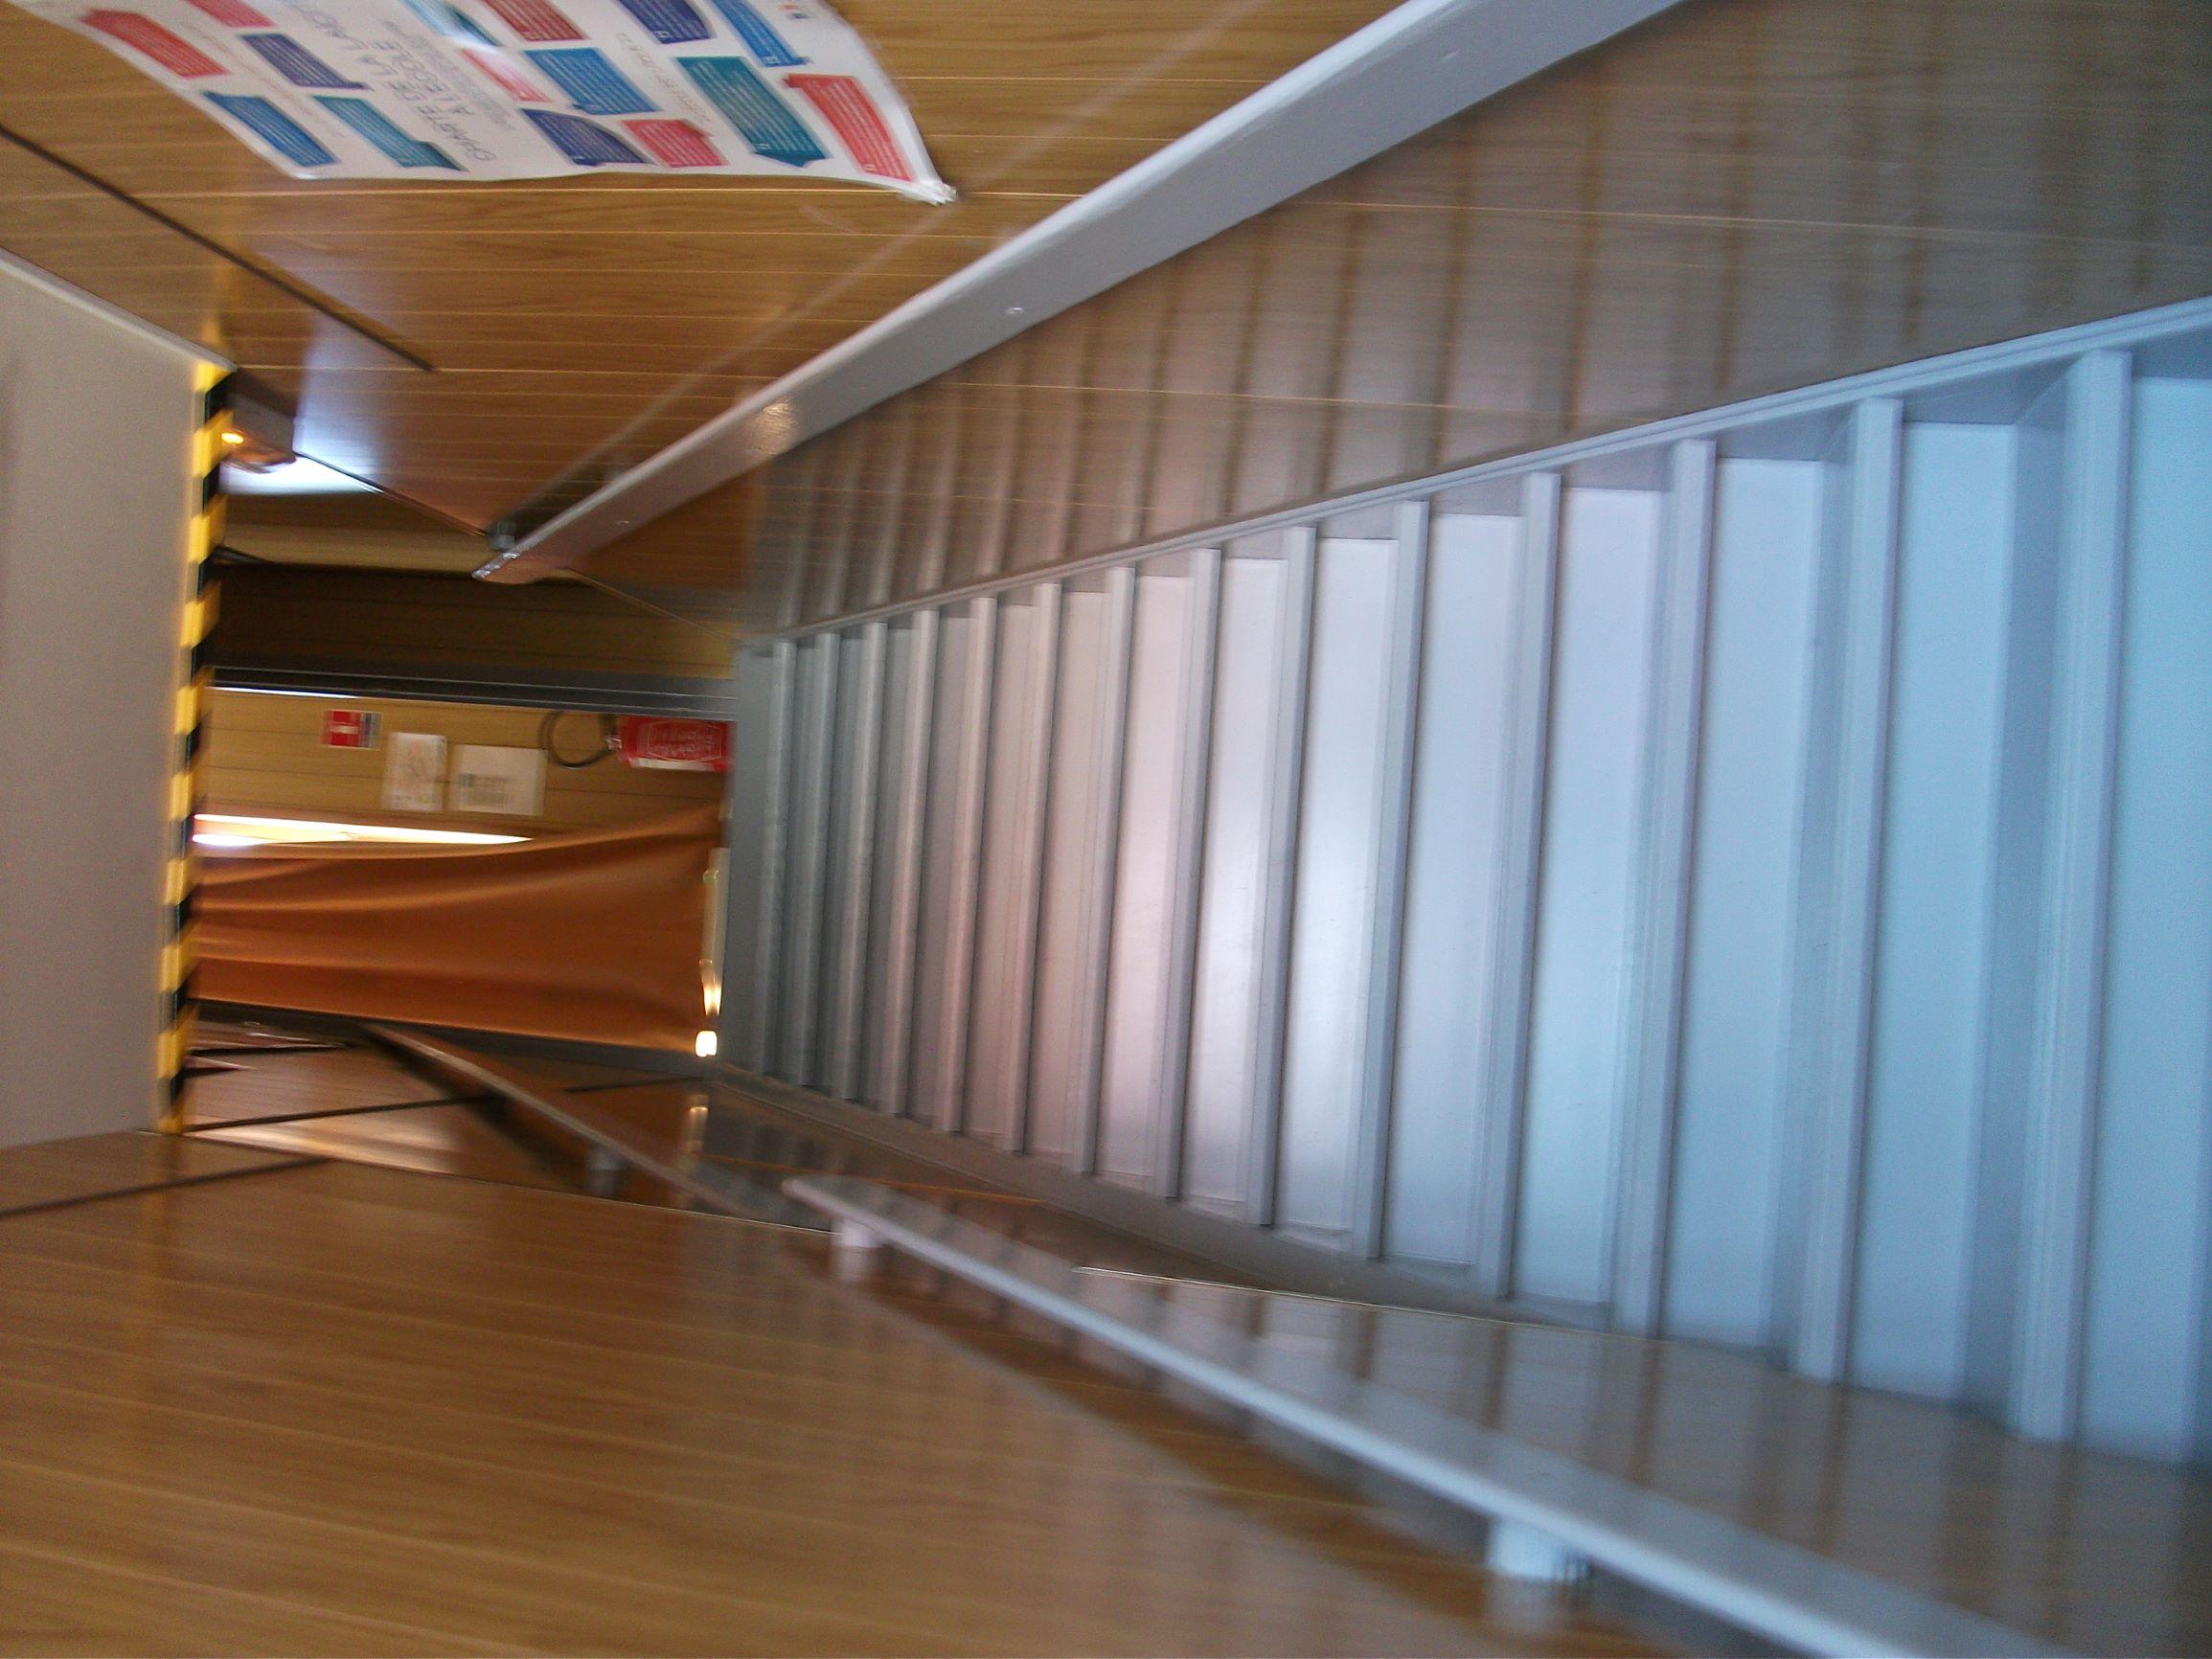 Ecole_MVDM_escalier_1.JPG